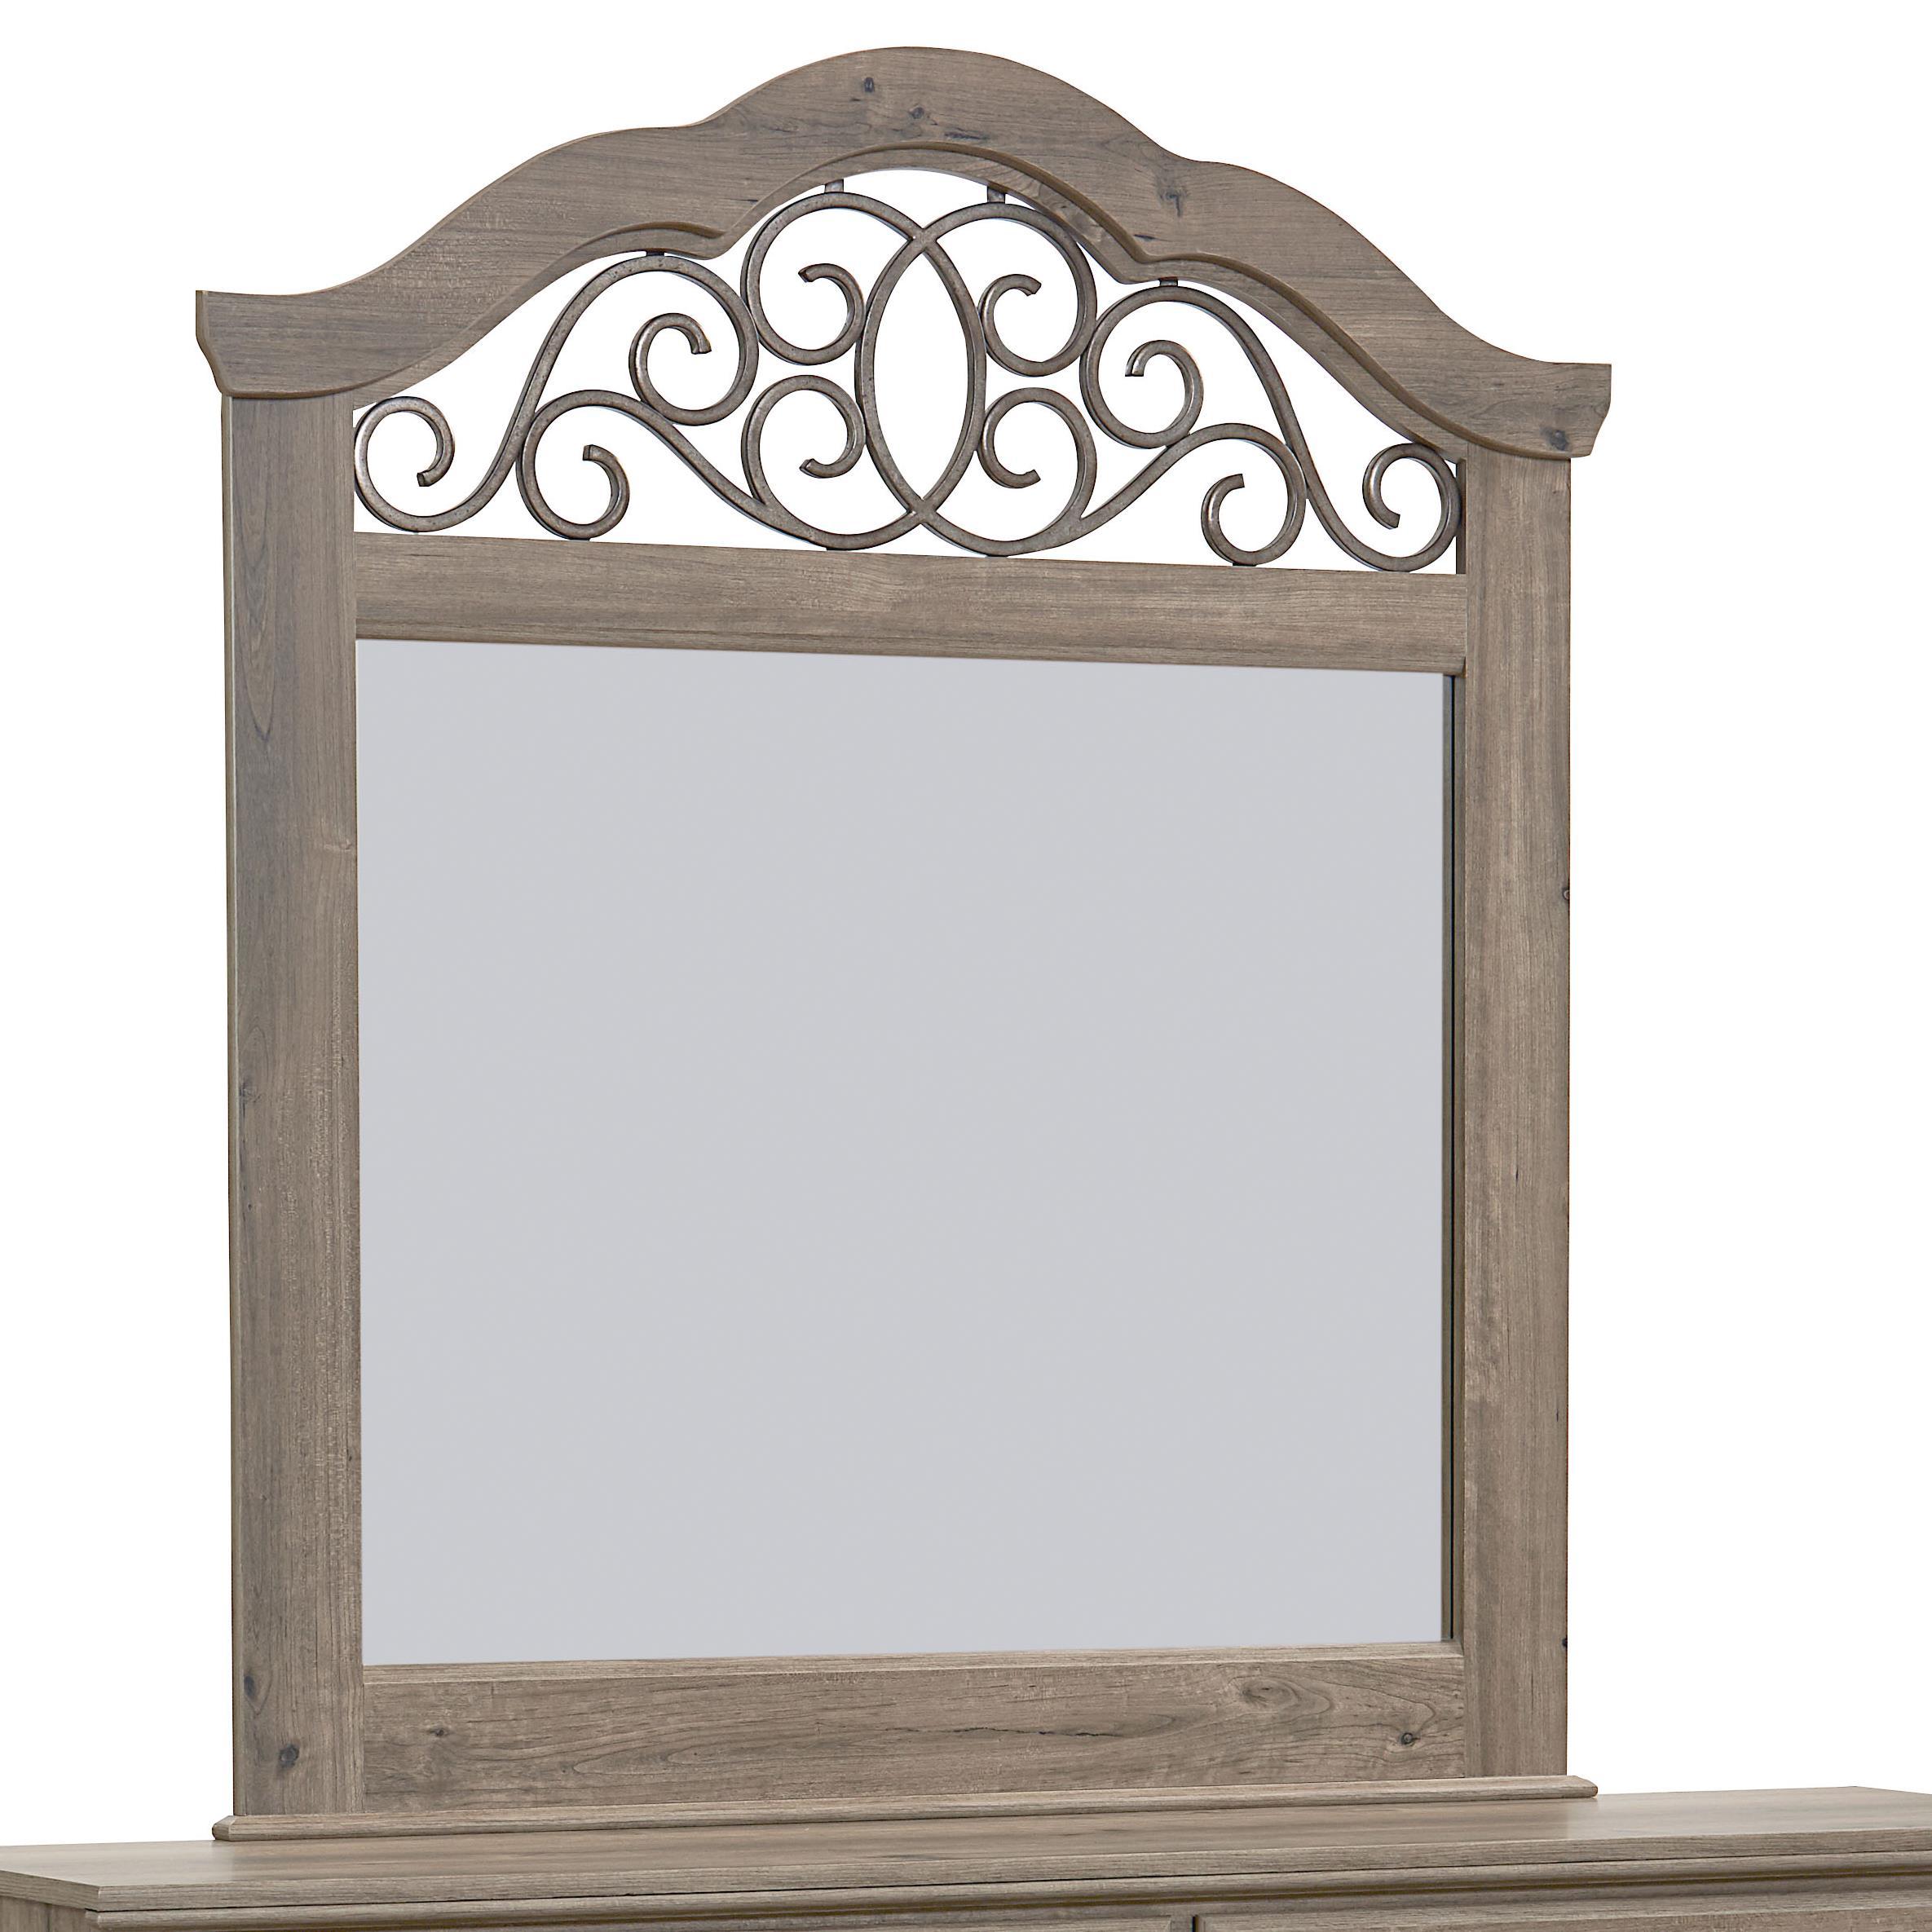 Standard Furniture Timber Creek Mirror                   - Item Number: 52668